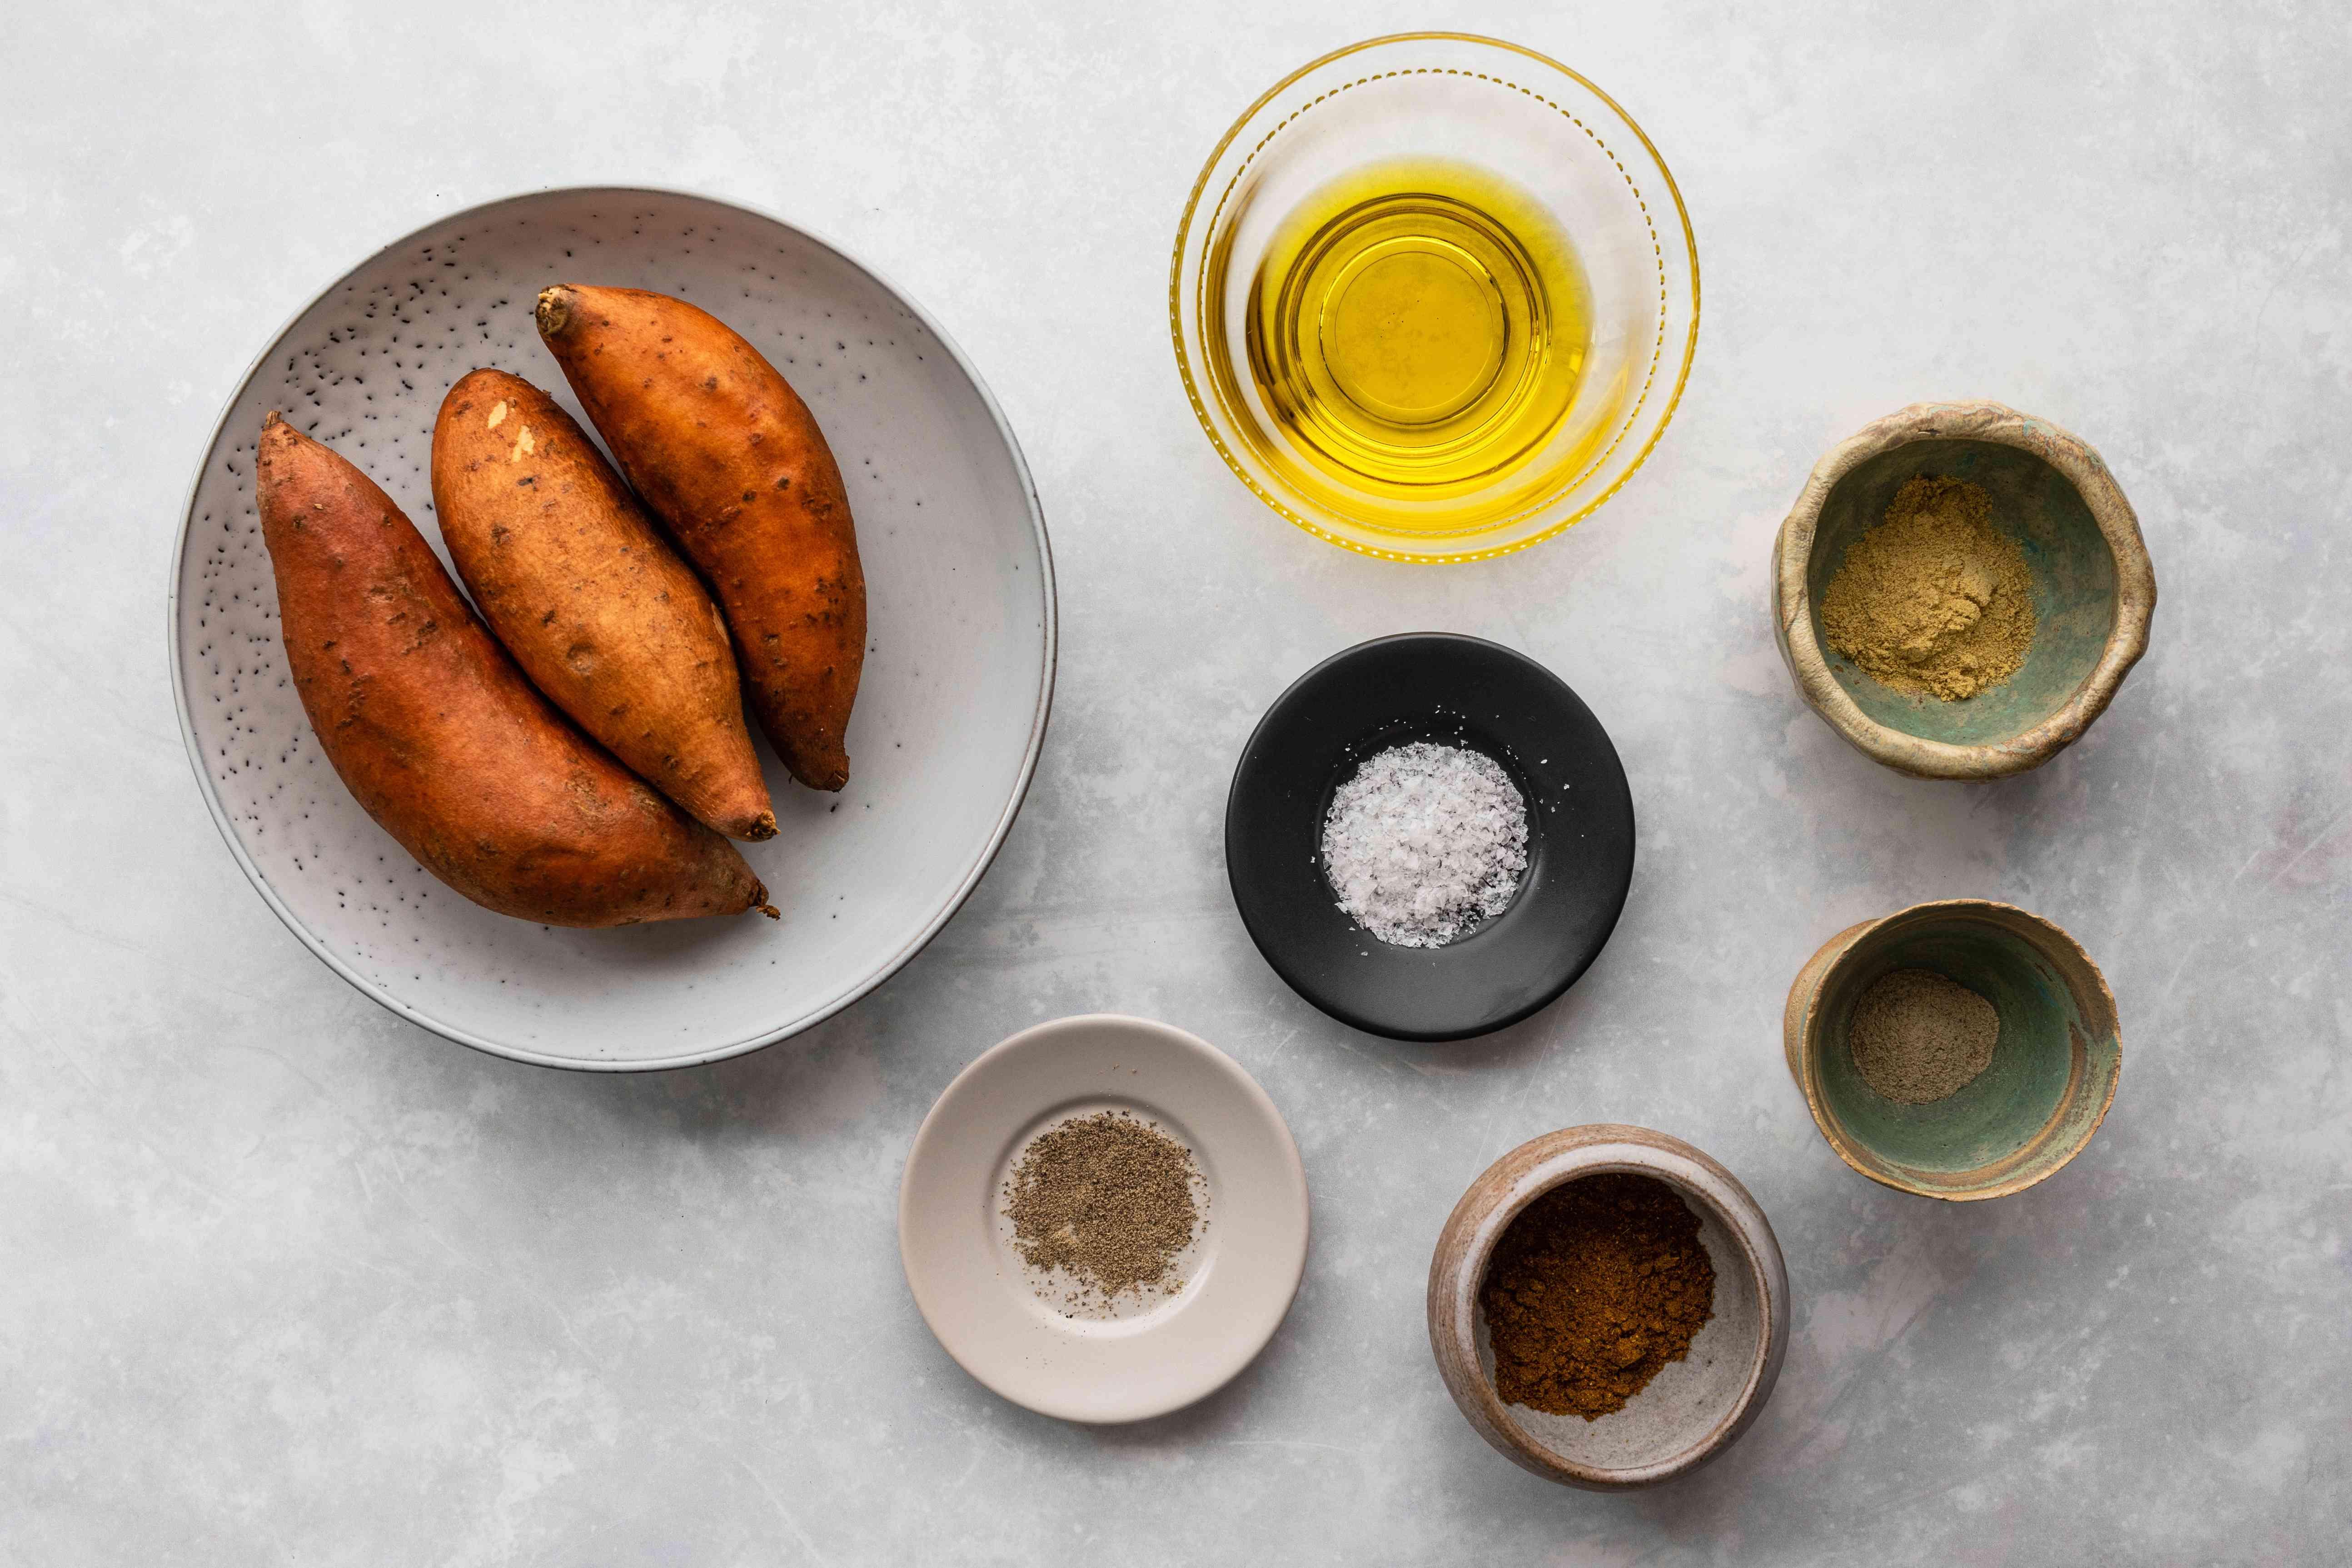 Ingredients for sweet potatoes